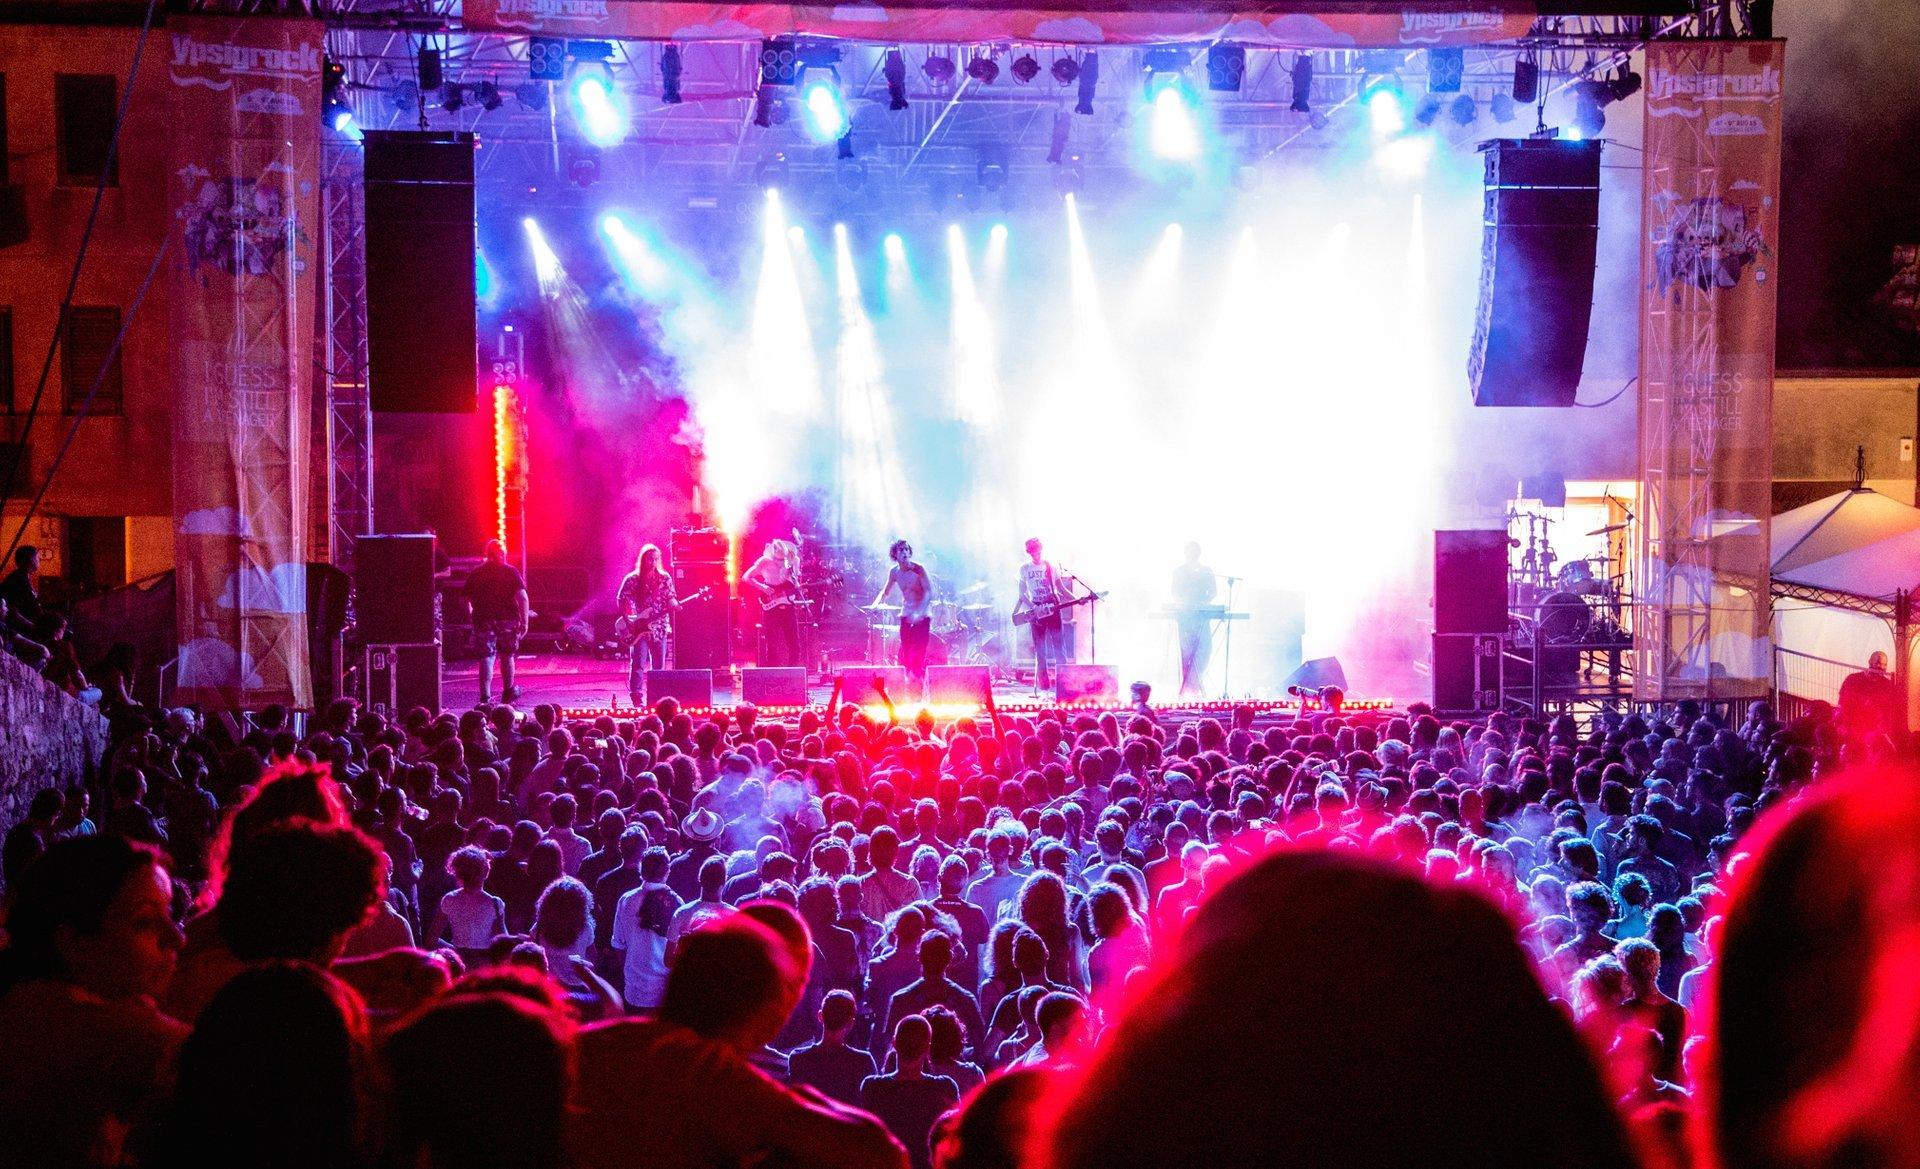 Ypsigrock Festival in Sicily 2020 - Best Time